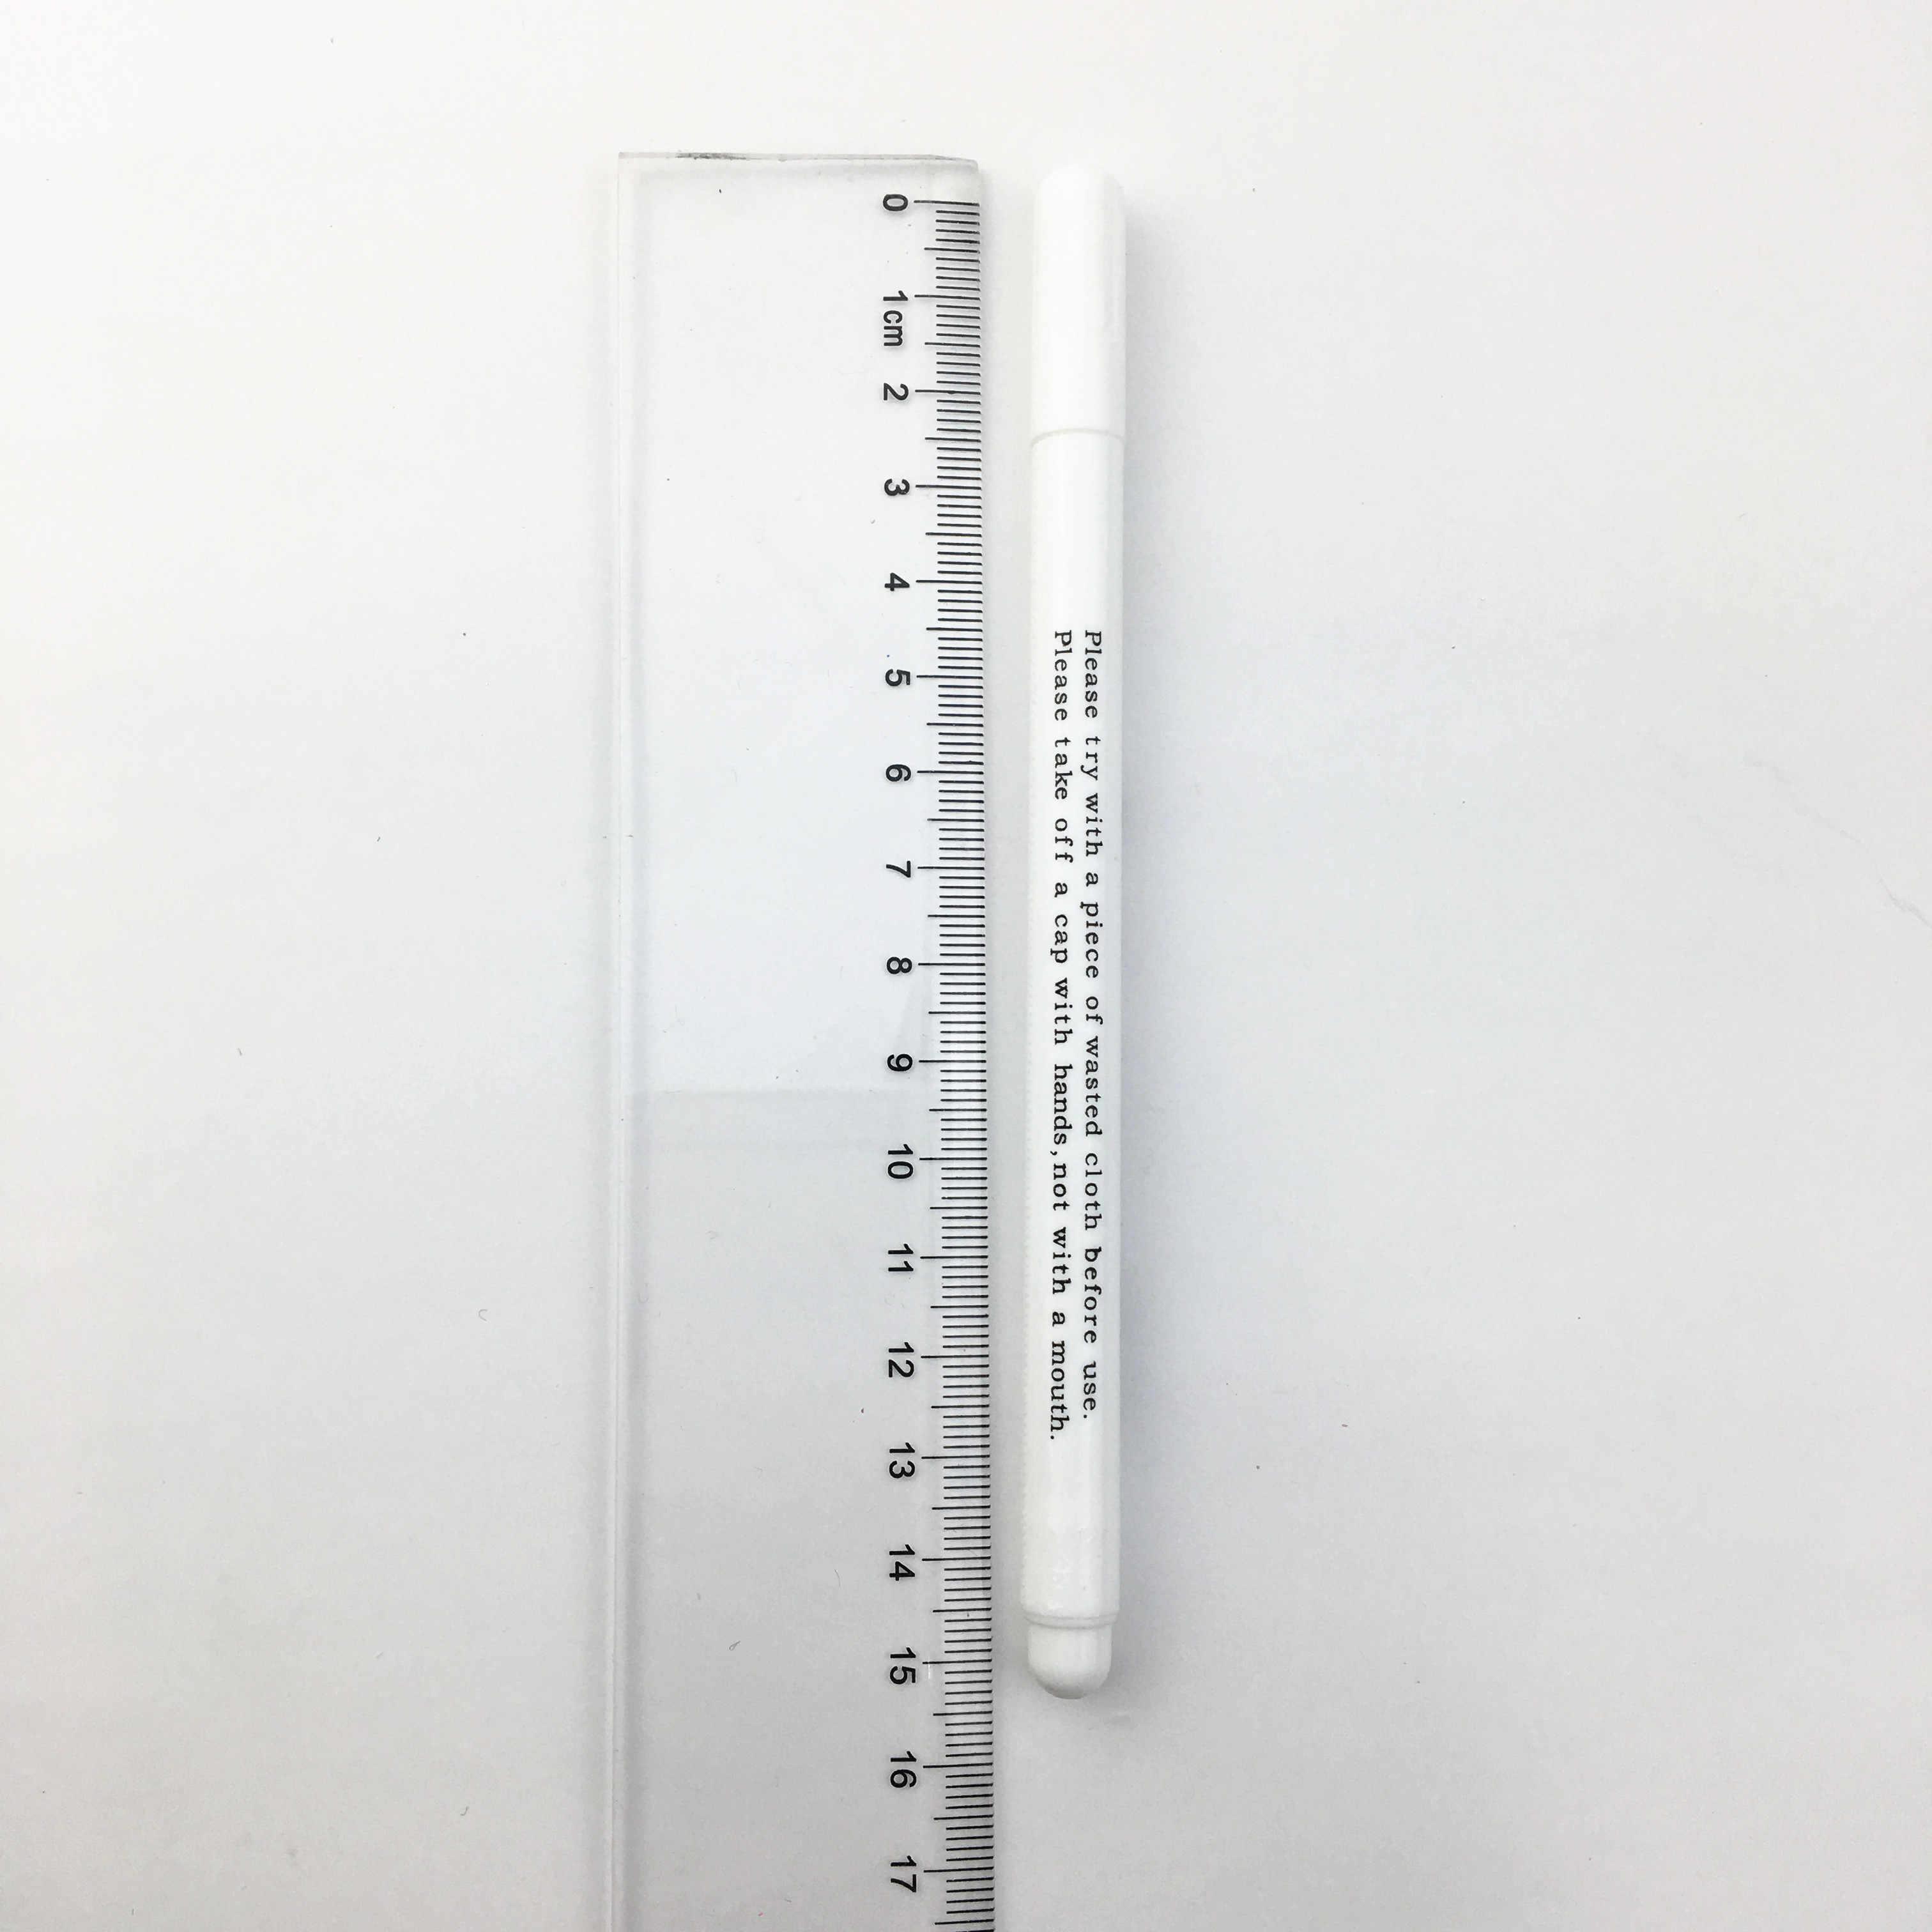 4pc水溶性ペンクロスステッチ水消去可能な鉛筆生地マーキングペンdiyファブリックマーカー縫製ツール布アクセサリー。Q